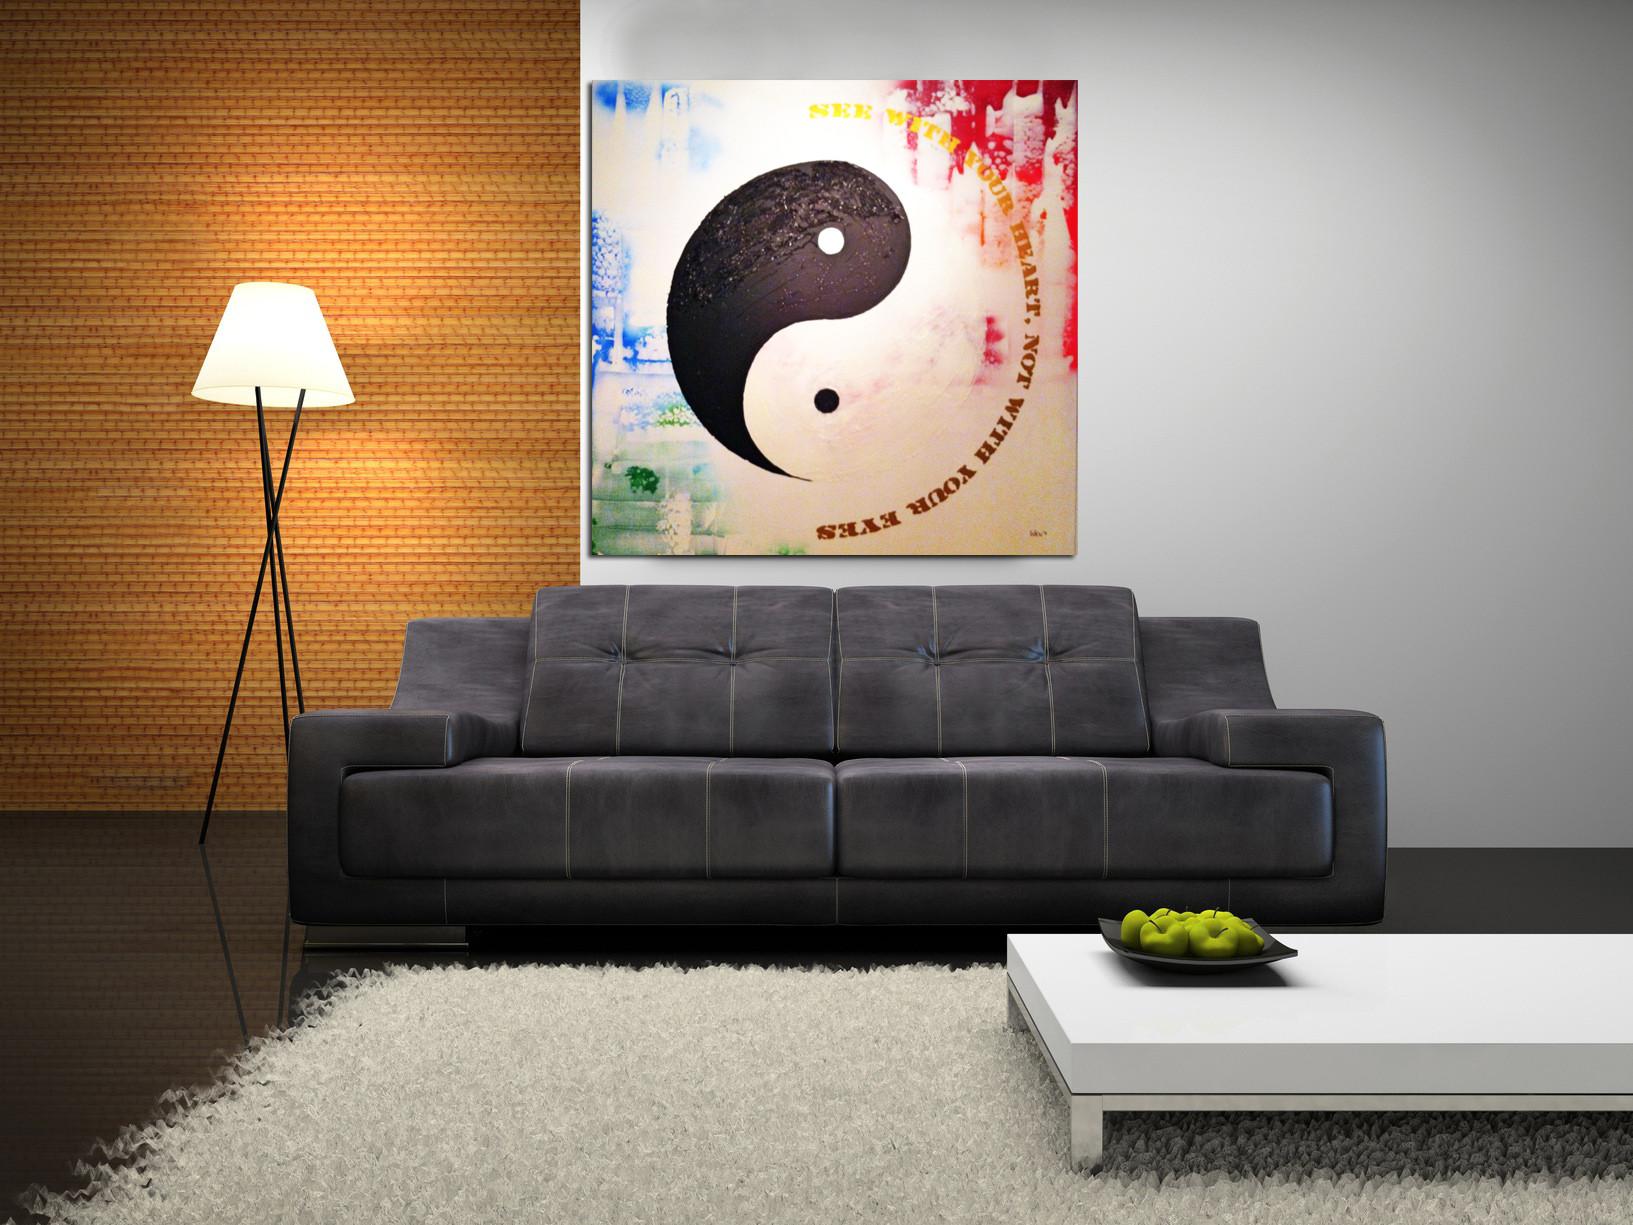 Yin Yang 130 x 130 cm